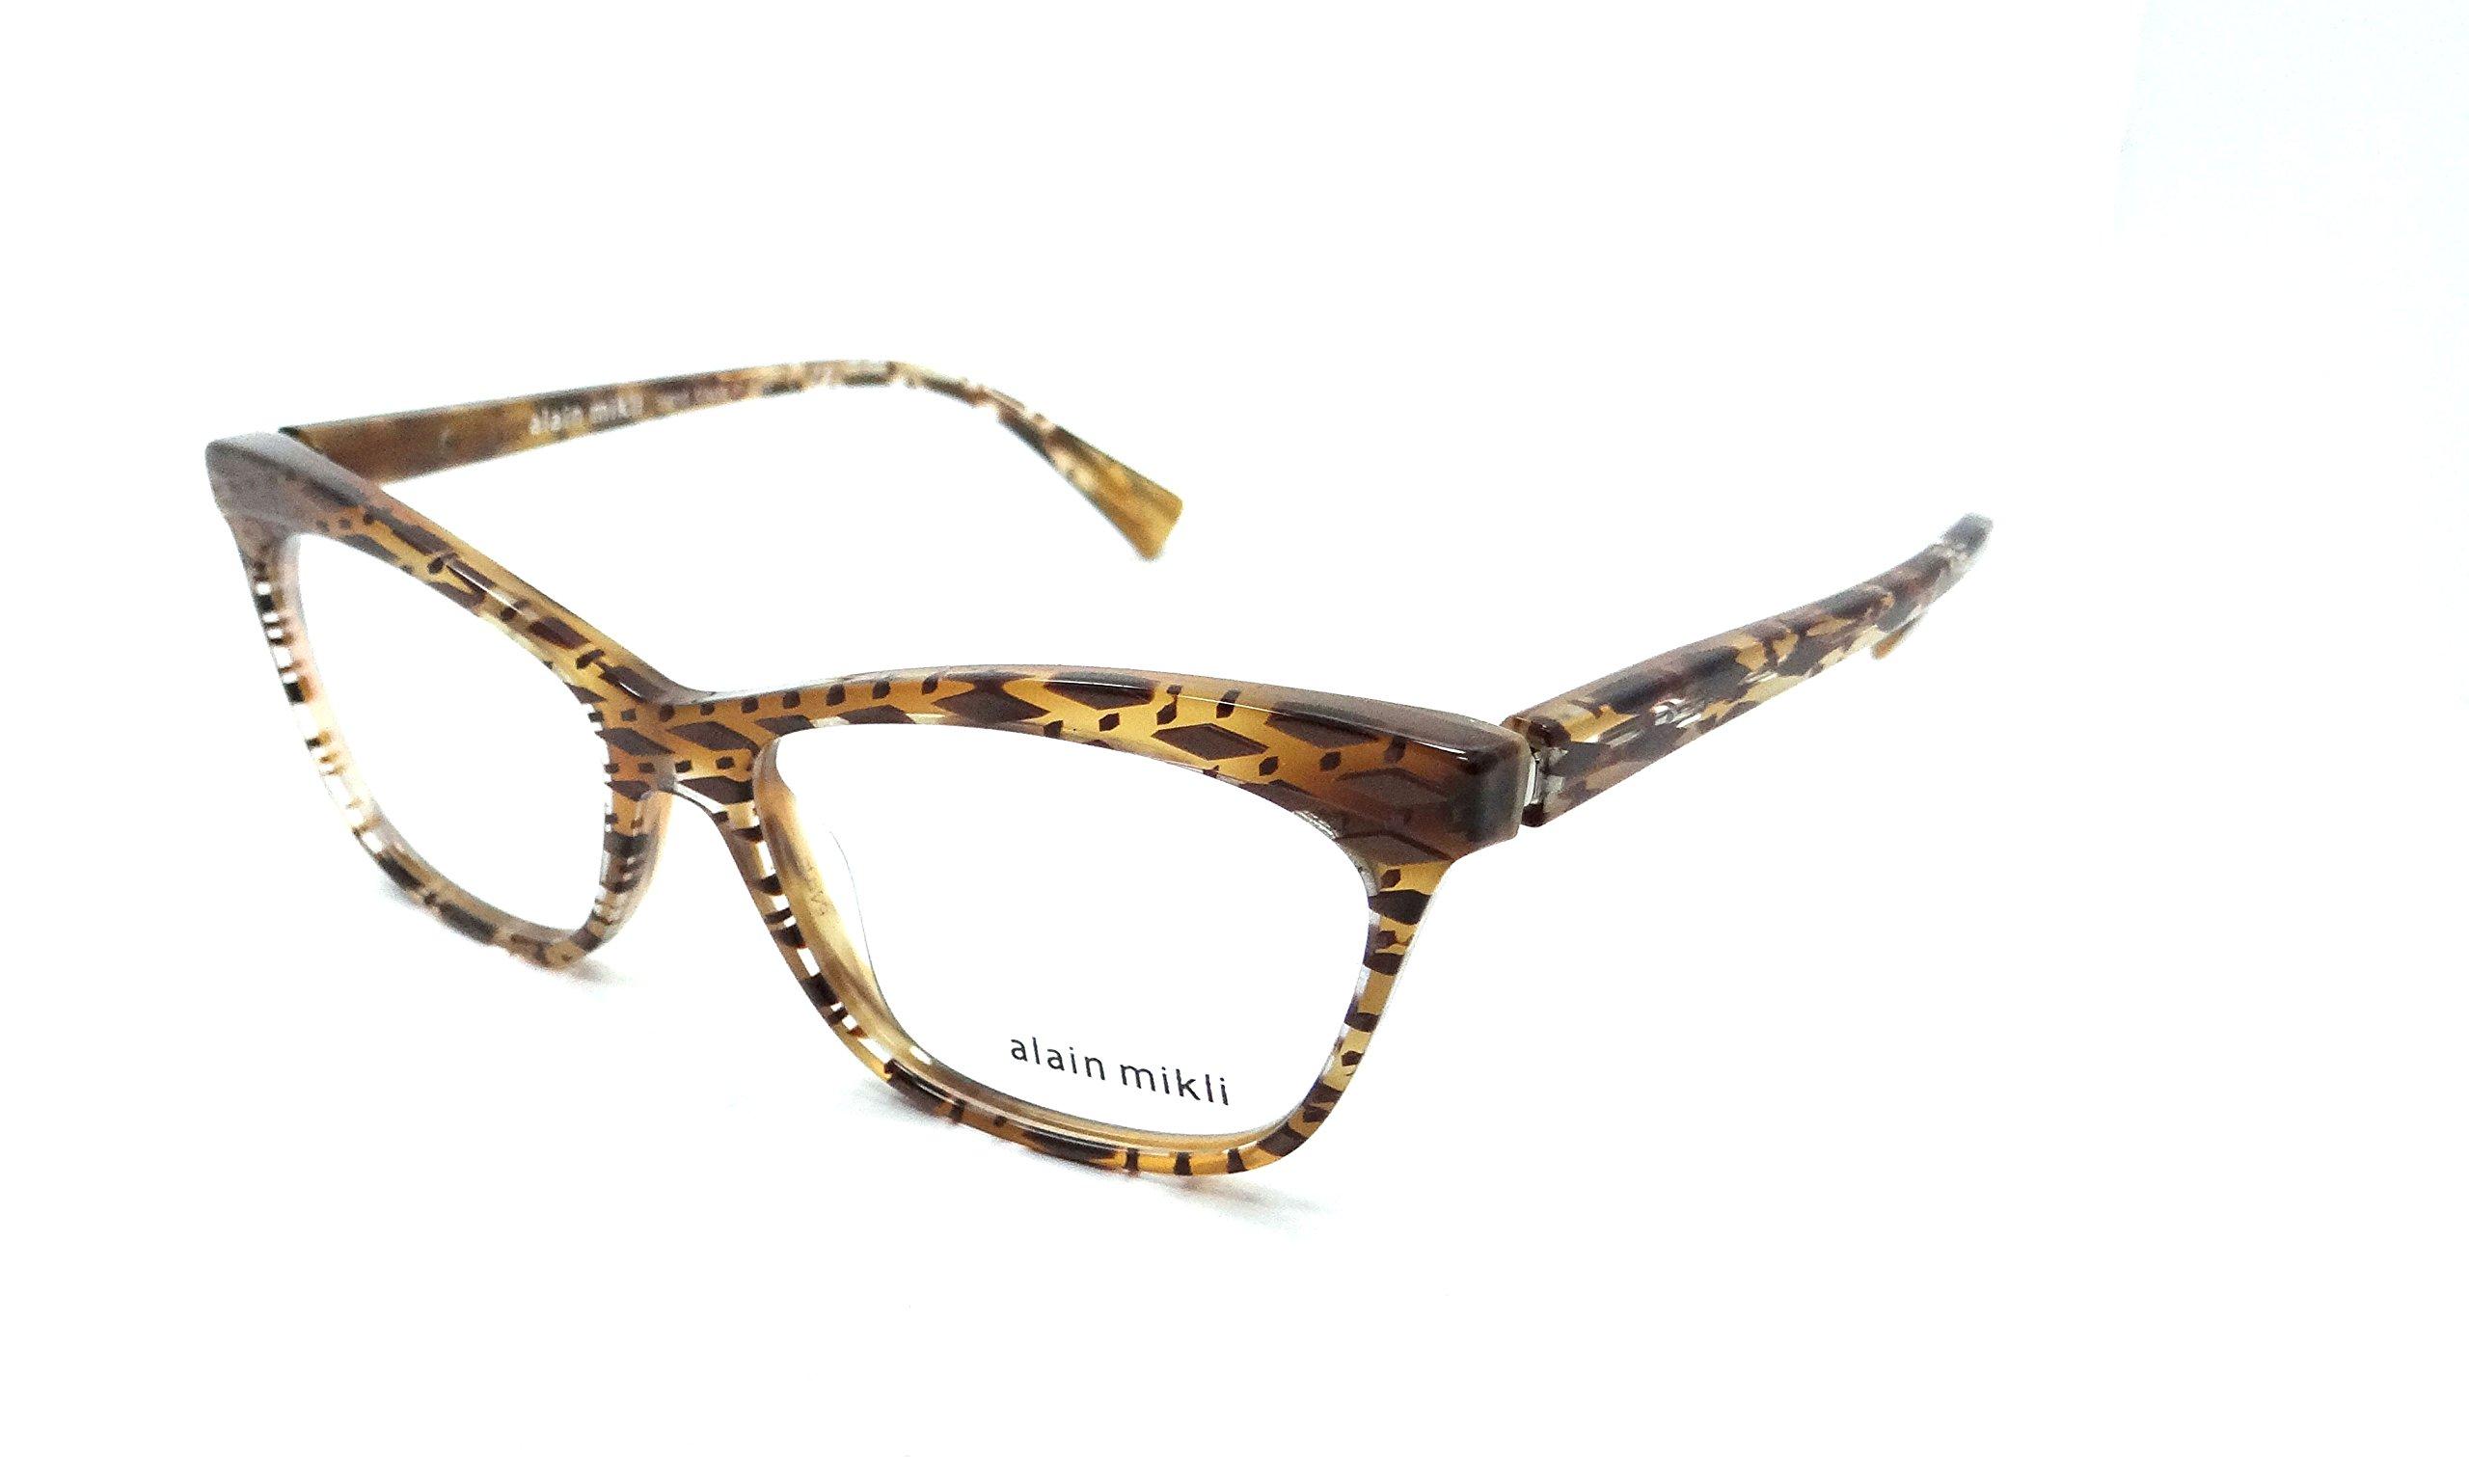 Alain Mikli Rx Eyeglasses Frames A03059 B0H2 54x15 Top Diamond Havana Italy